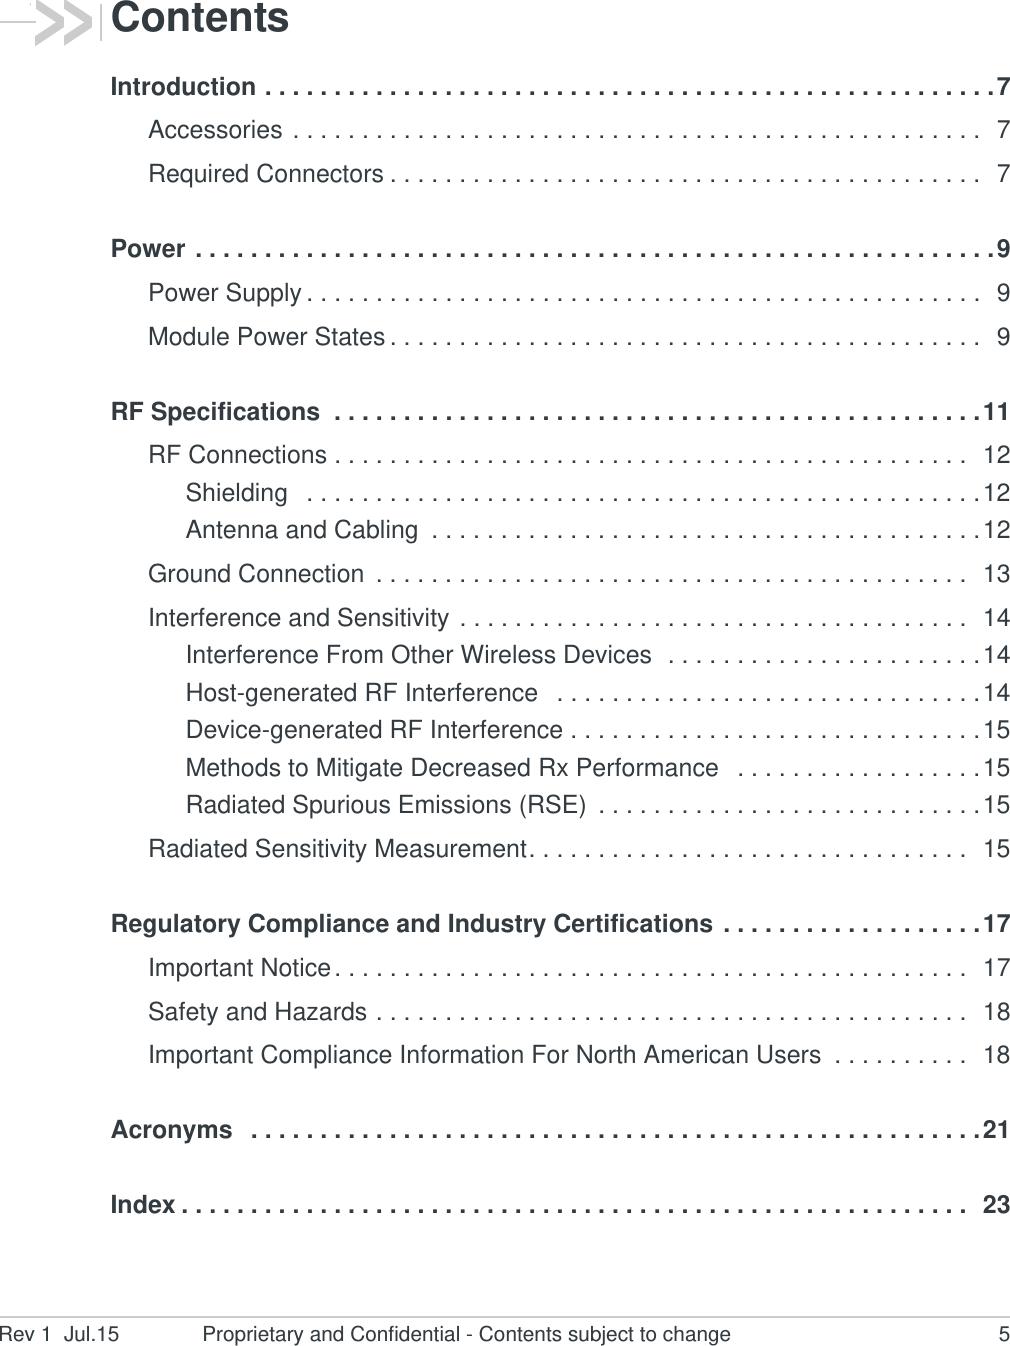 Sierra Wireless EM7455 Radio Module User Manual AirPrime